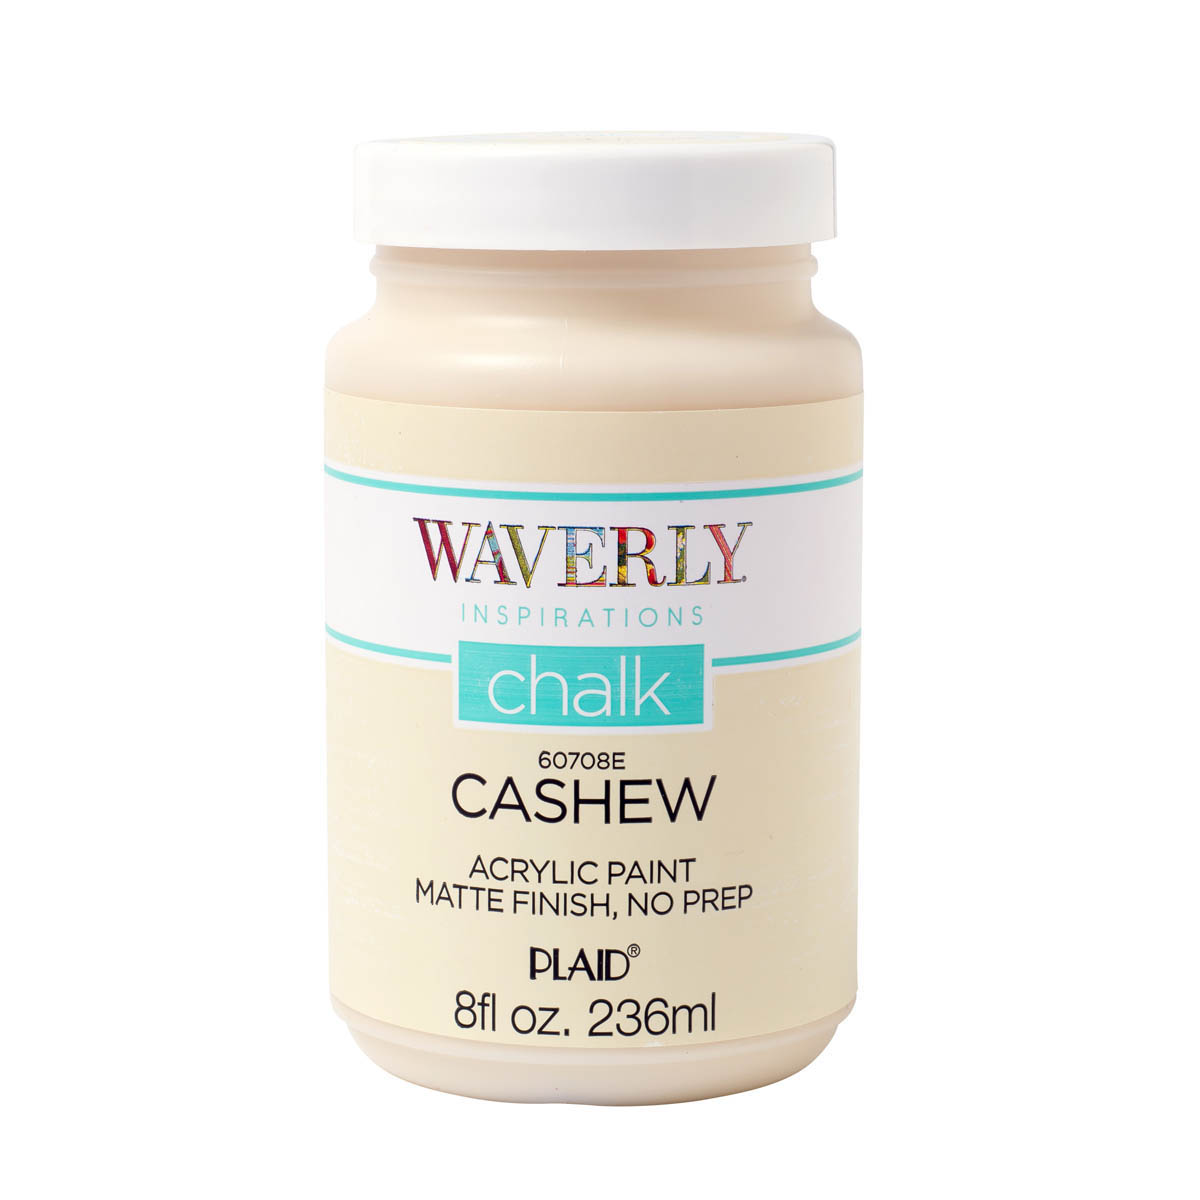 Waverly ® Inspirations Chalk Acrylic Paint - Cashew, 8 oz. - 60708E